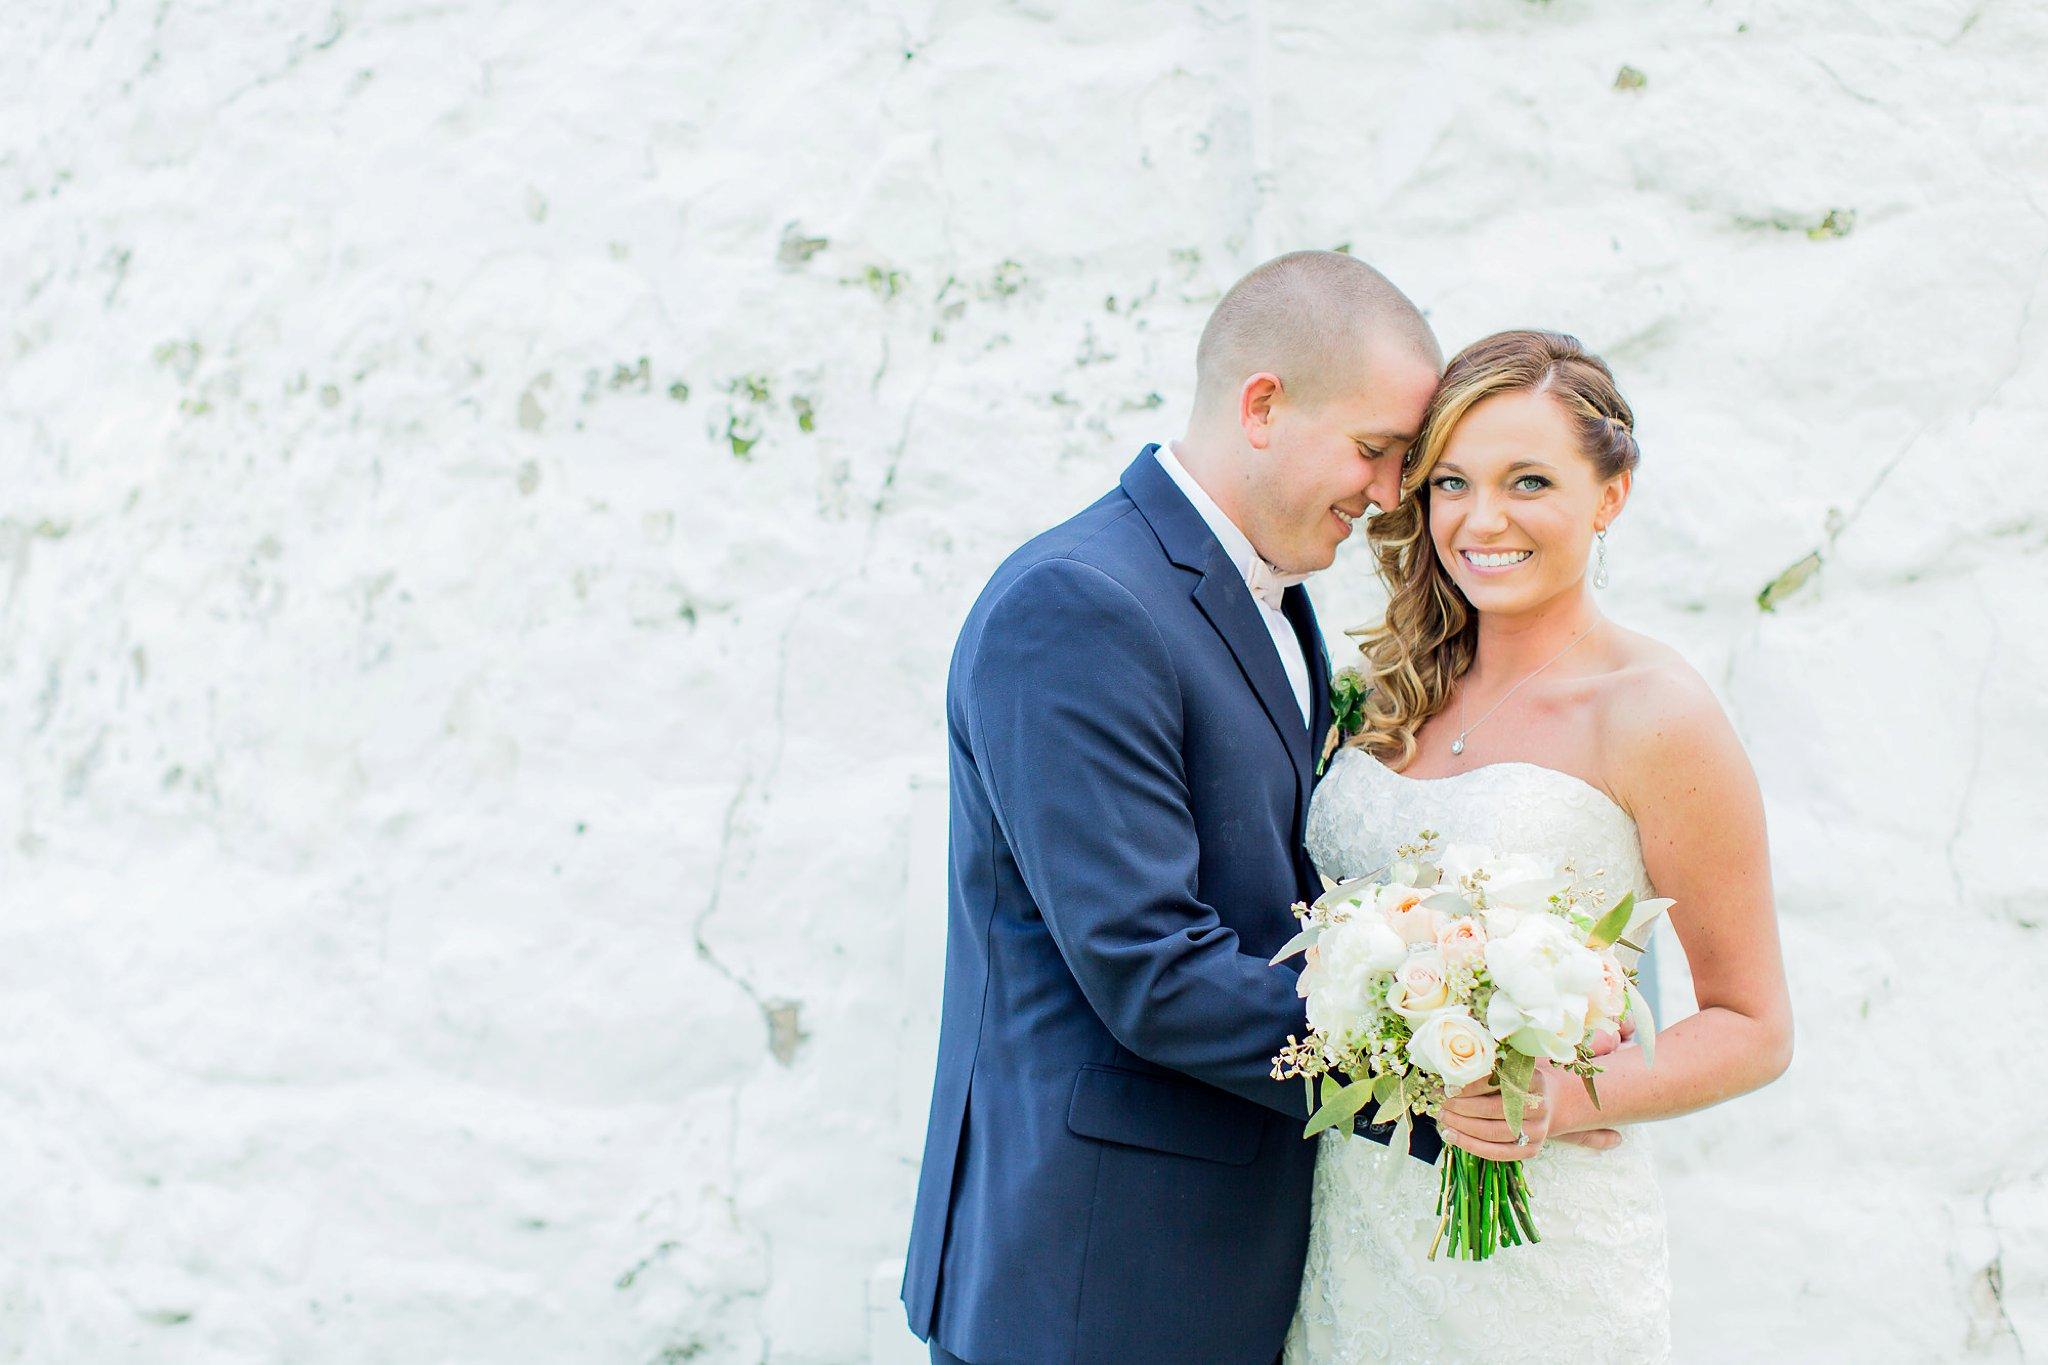 Spring Hill Manor Wedding Photos Maryland Wedding Photographer-39.jpg